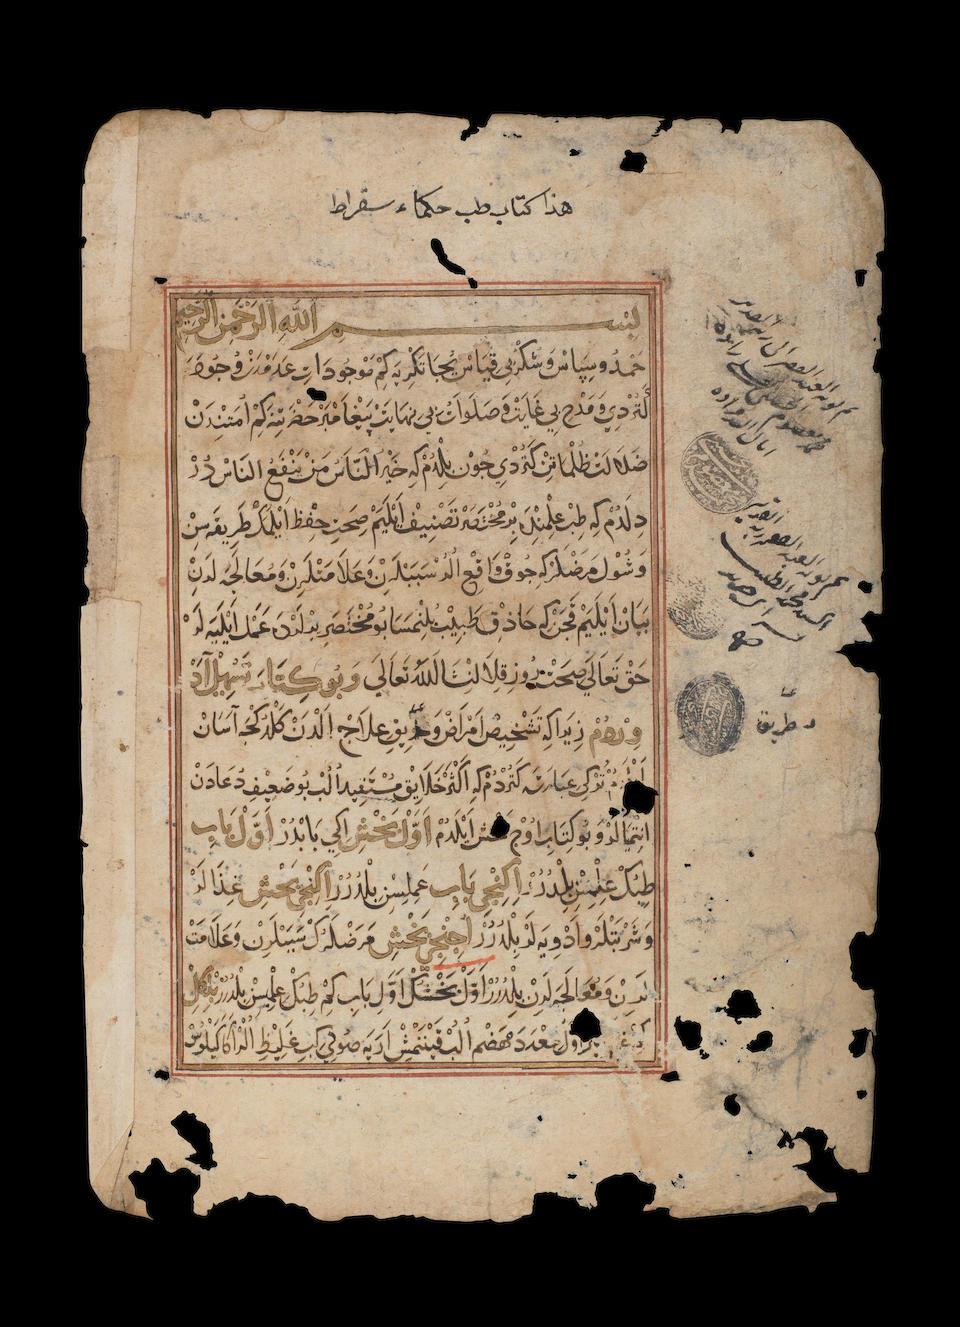 A medical treatise on the diagnosis of ailments and their treatments, copied by Jalal al-Din bin Mahmud al-'Ala'i Ottoman Turkey, dated AH 810/AD 1407-08